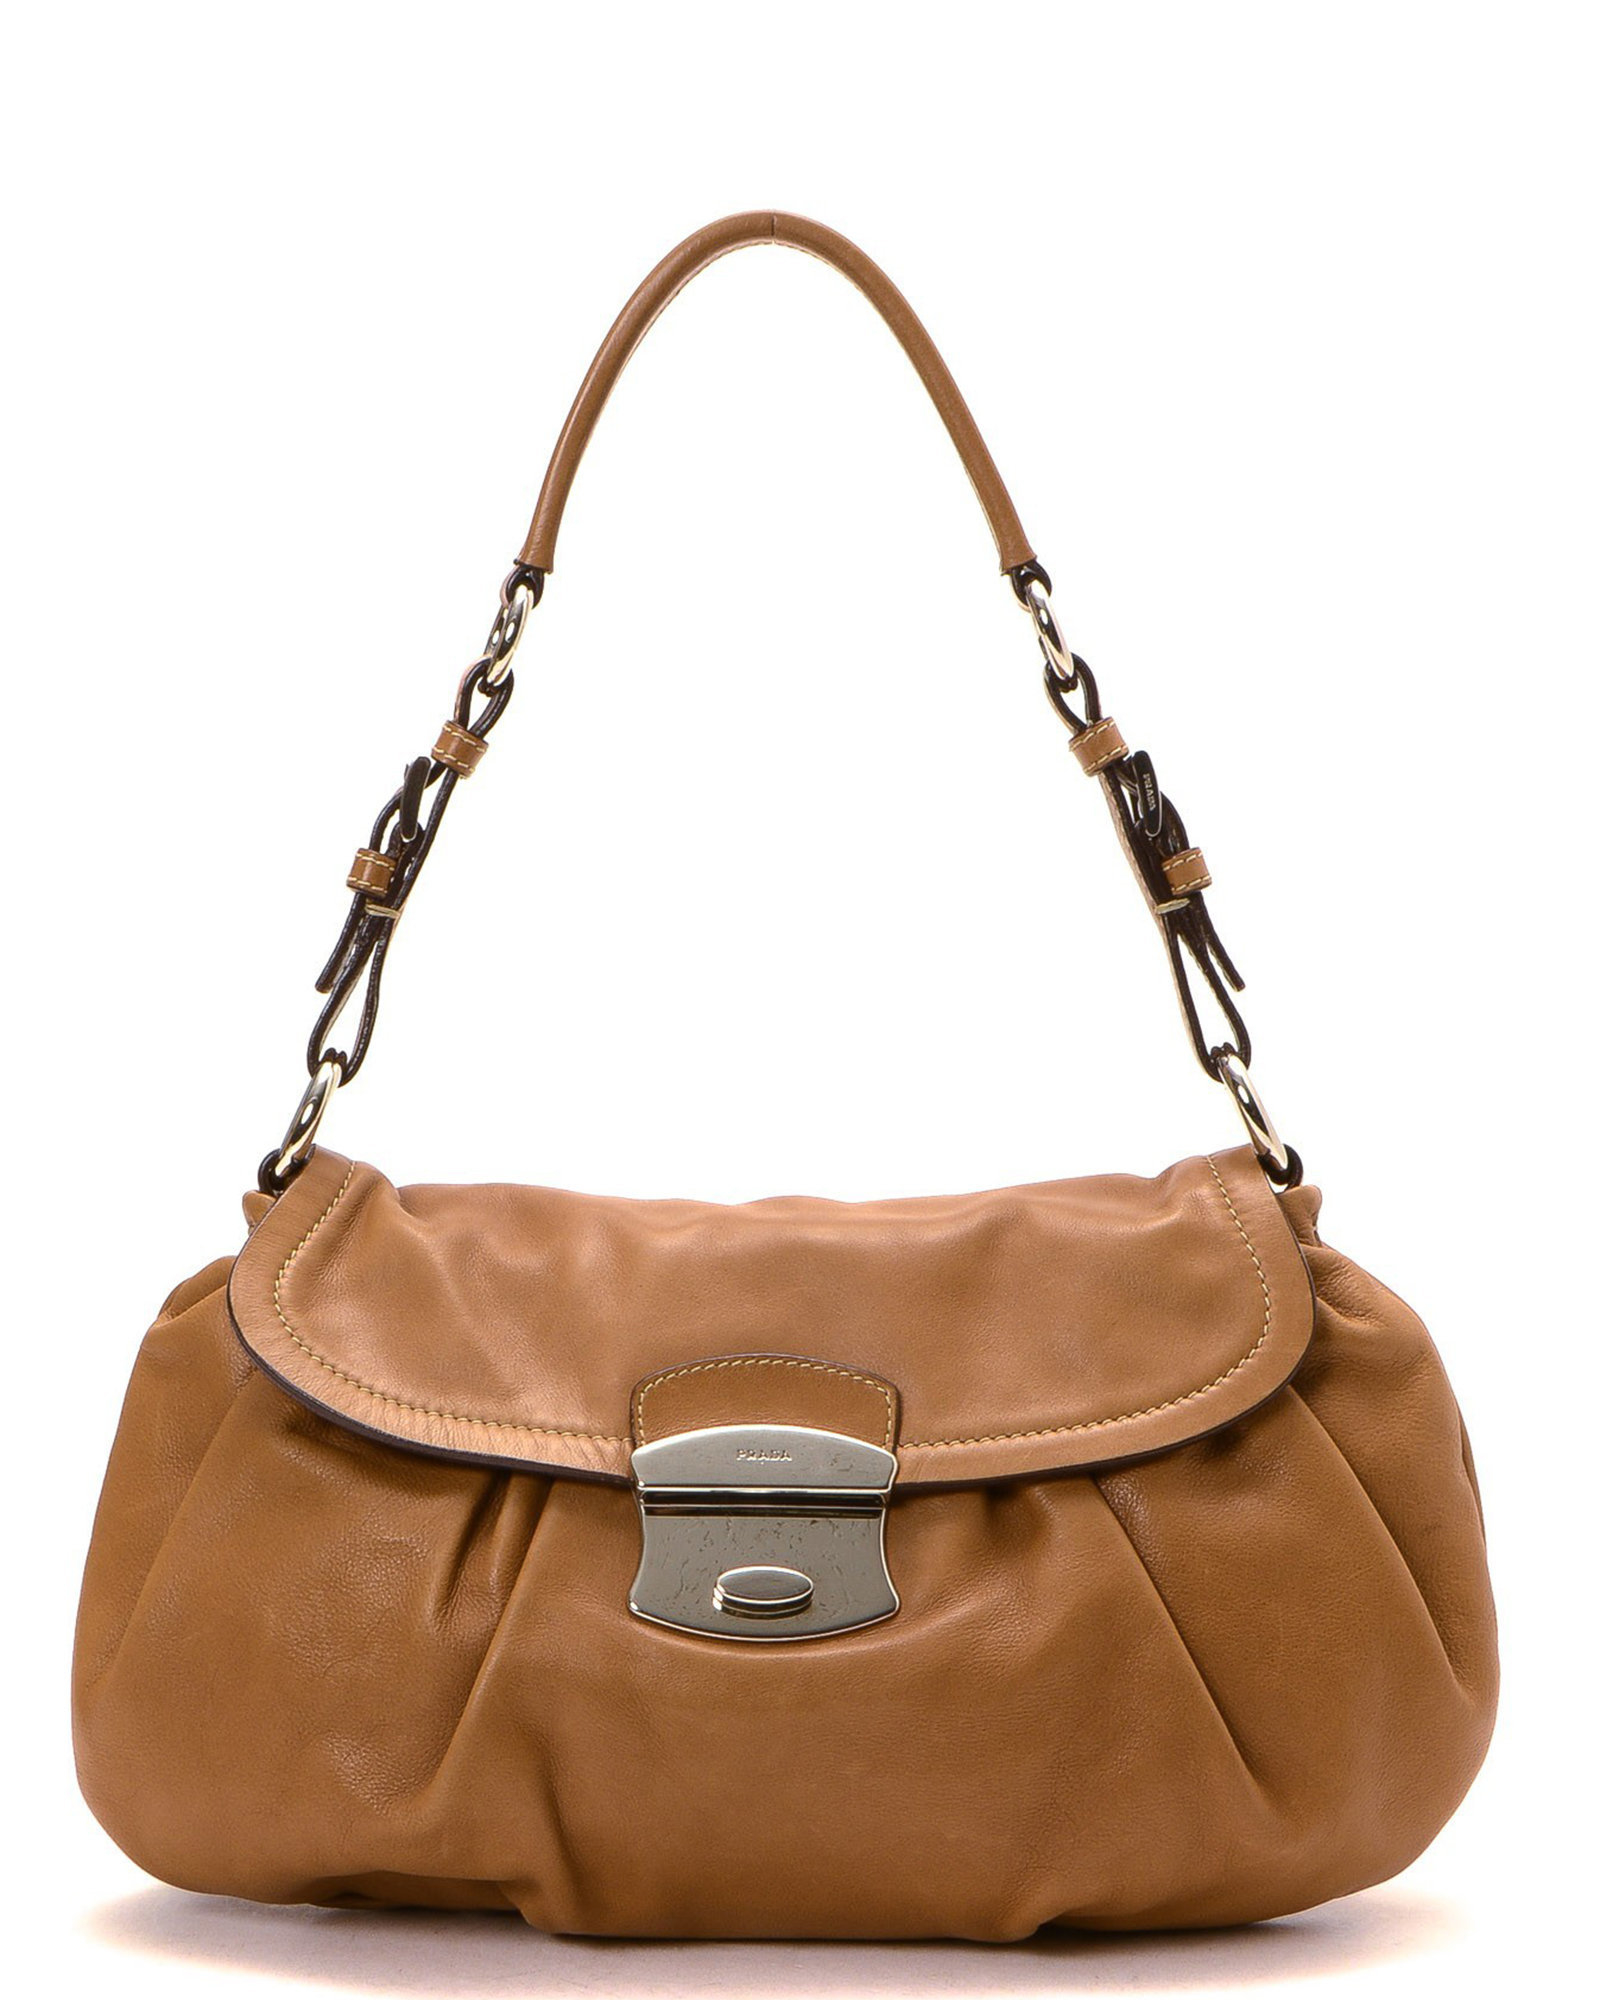 455dc521d516 Prada Shoulder Bag - Vintage in Brown | Lyst